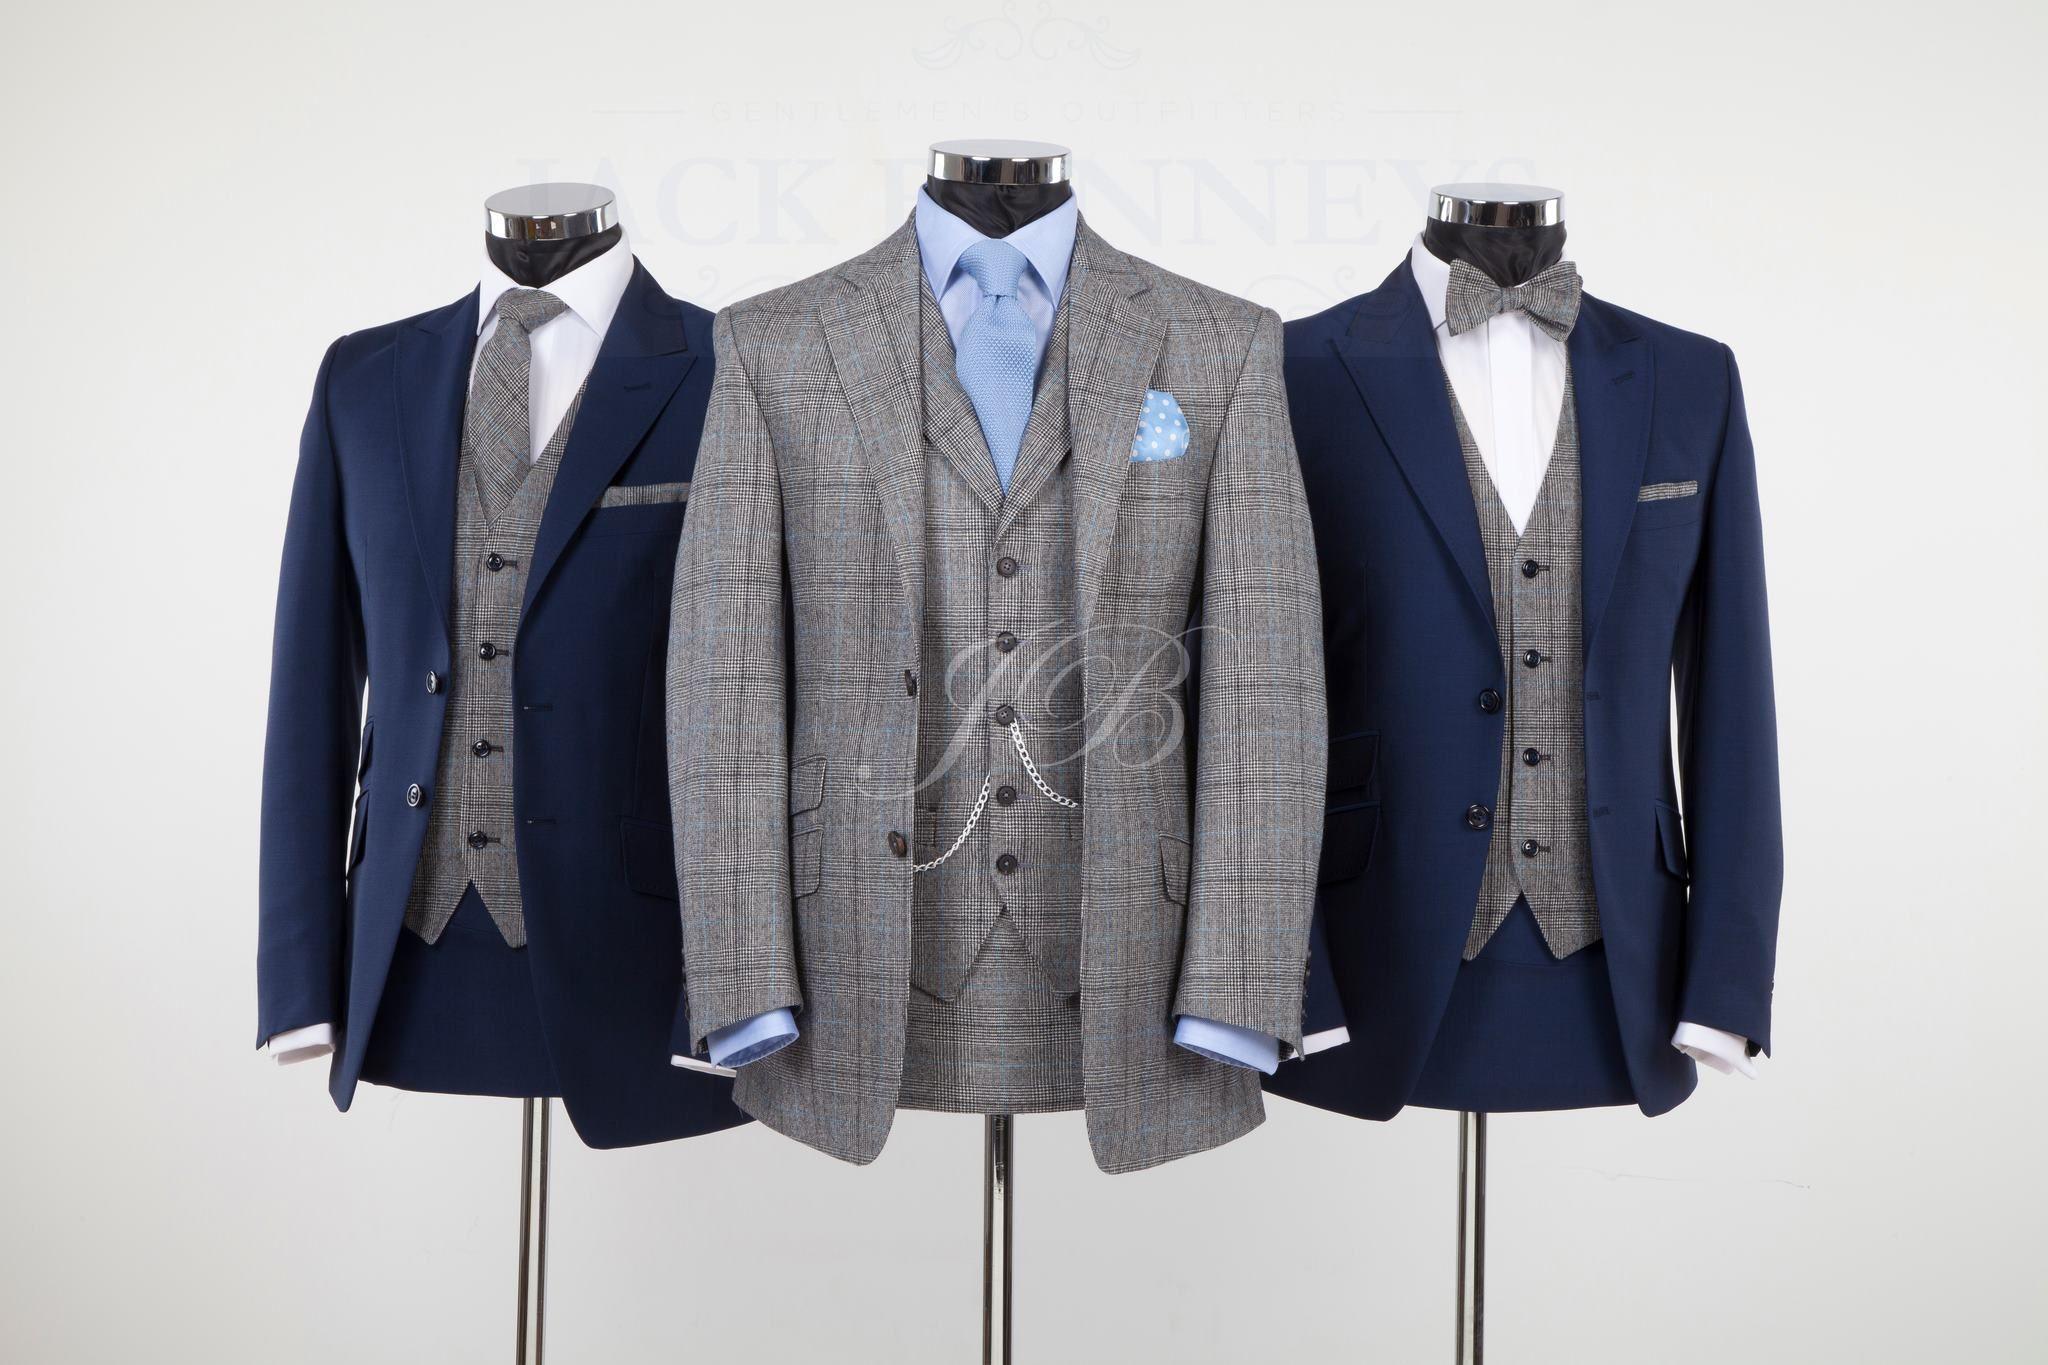 Pin By Jack Bunneys Tailors On Jackbunneys Bespoke Hire Wedding Suit Hire Vintage Wedding Suits Tweed Wedding Suits